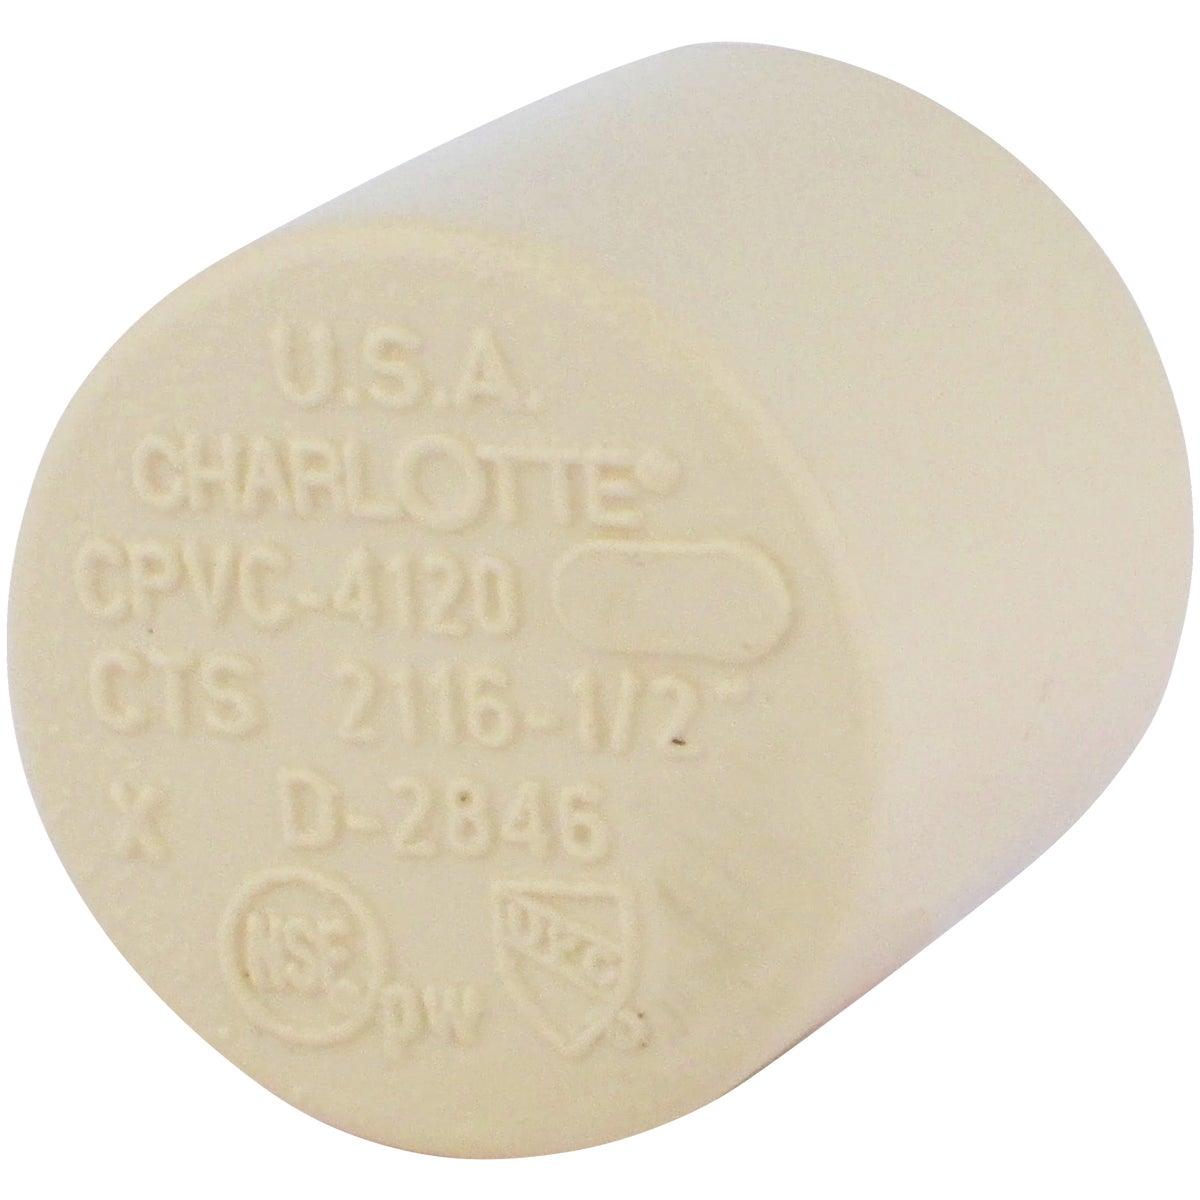 "1/2"" CPVC CAP - 50155 by Genova Inc"